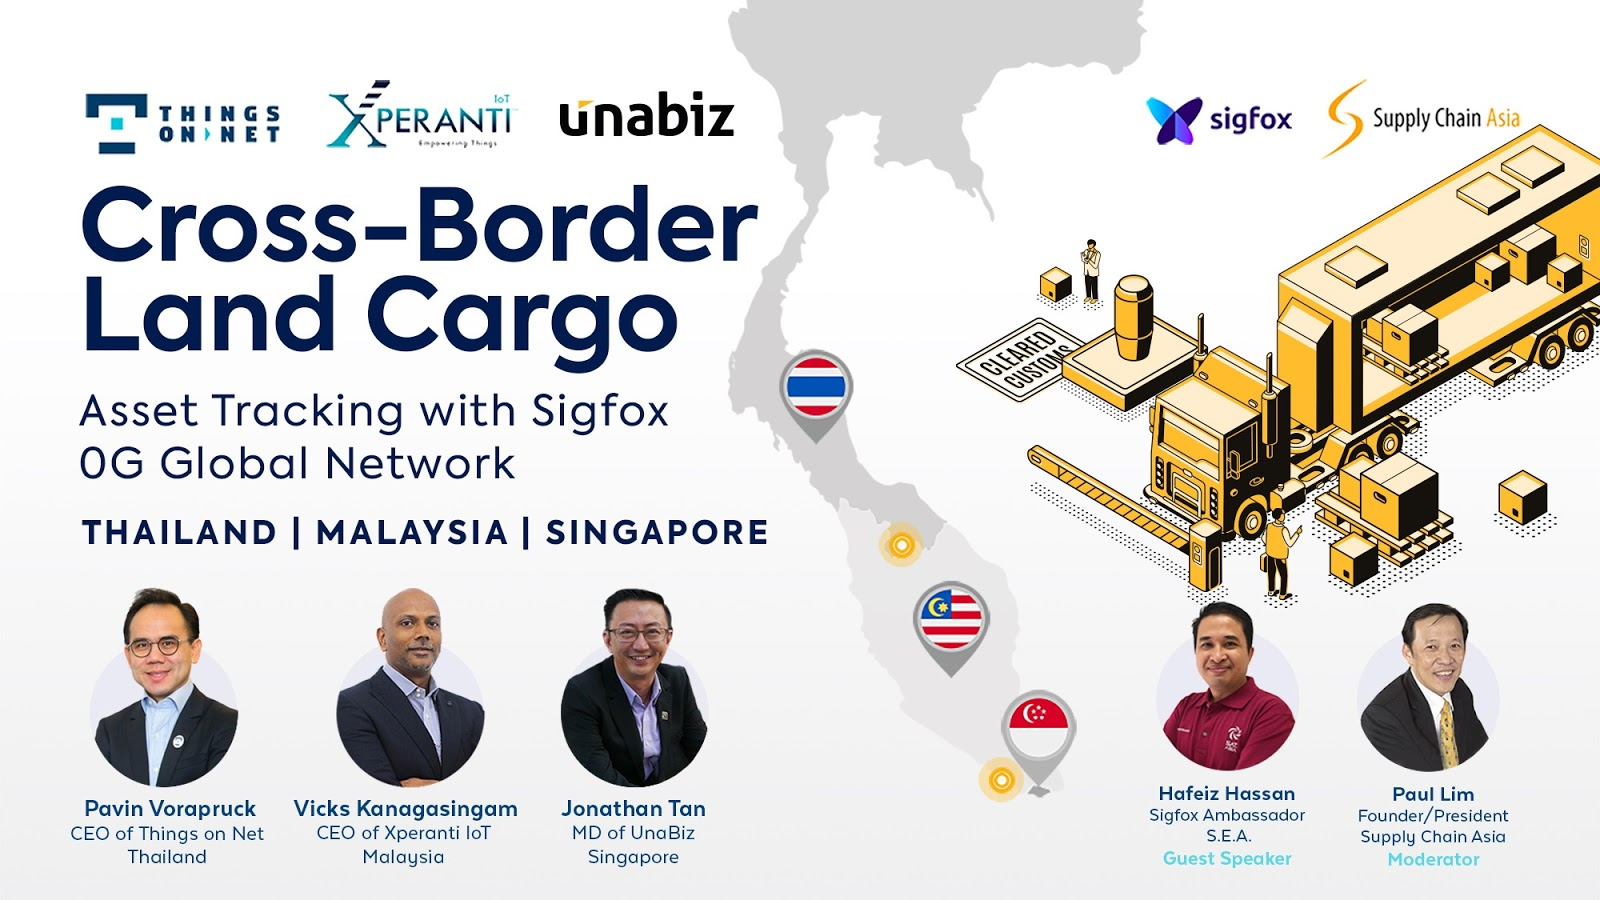 TUX เพิ่มความยืดหยุ่นของซัพพลายเชนด้านขนส่งระหว่างประเทศ Singapore - Malaysia - Thailand